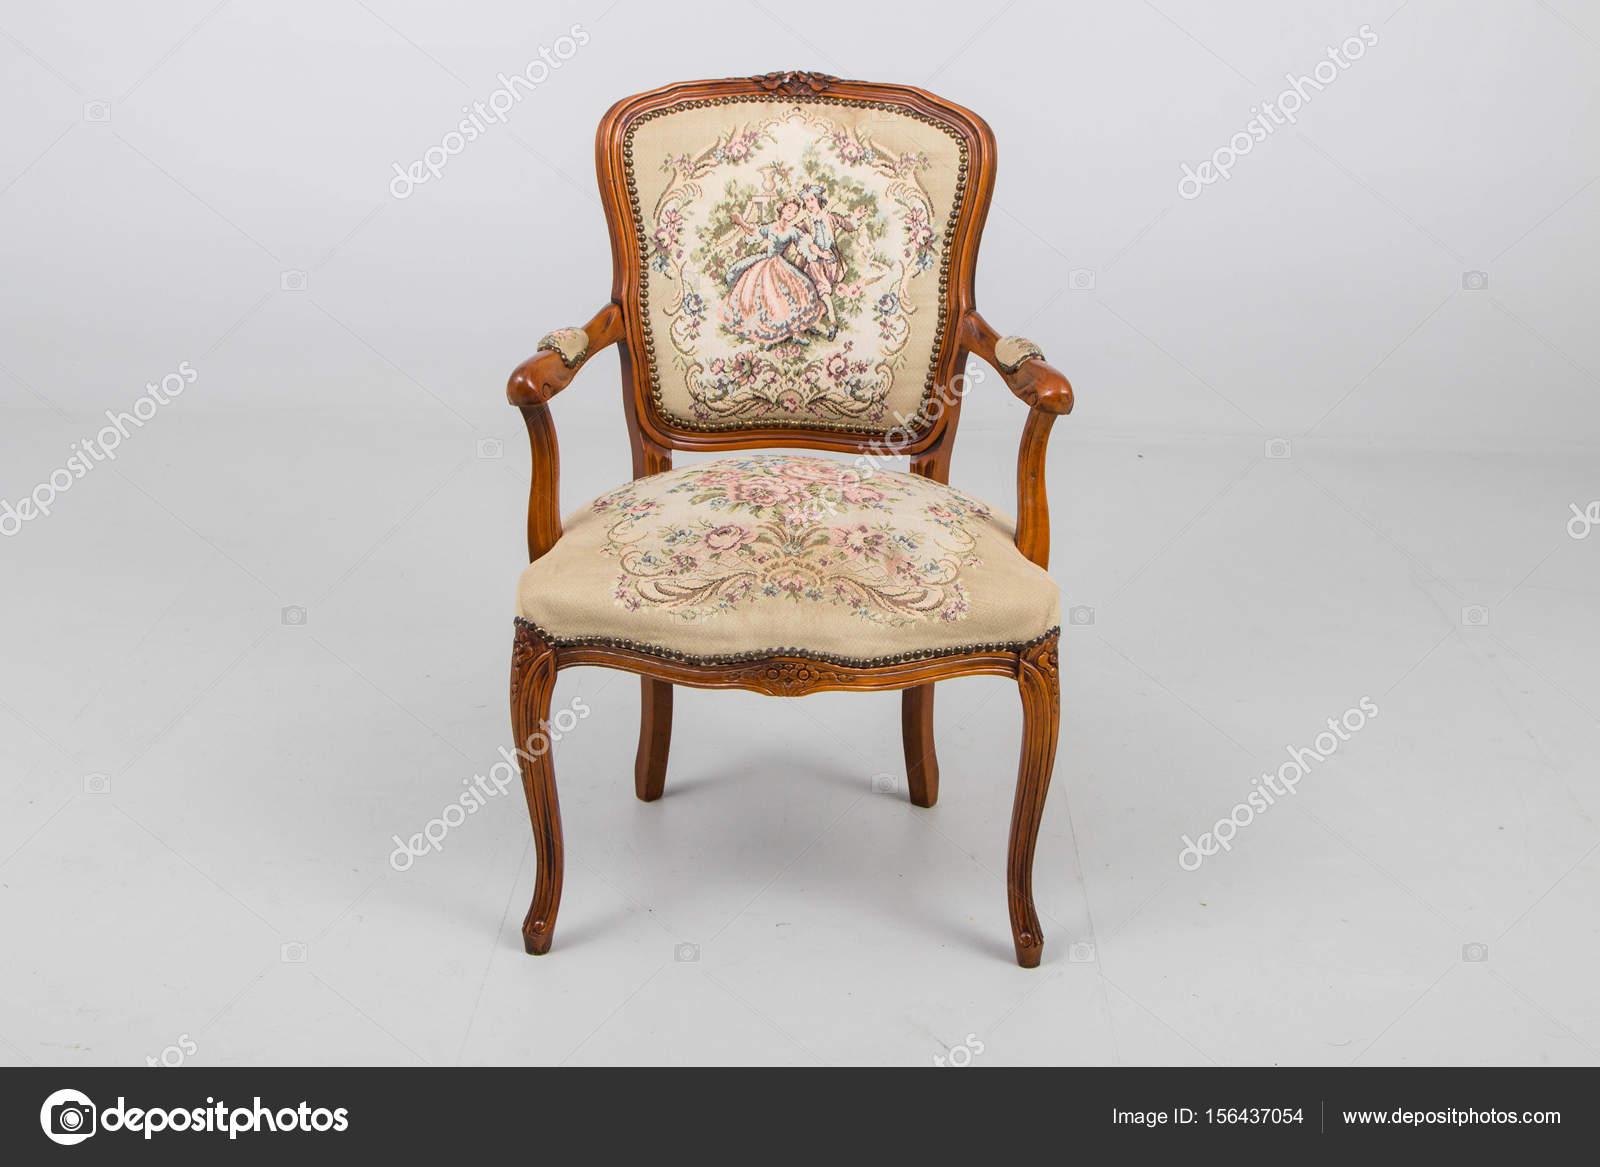 Sedie Poltrone Antiche.Sedie Poltrone Antiche Foto Stock C Jbgroup 156437054